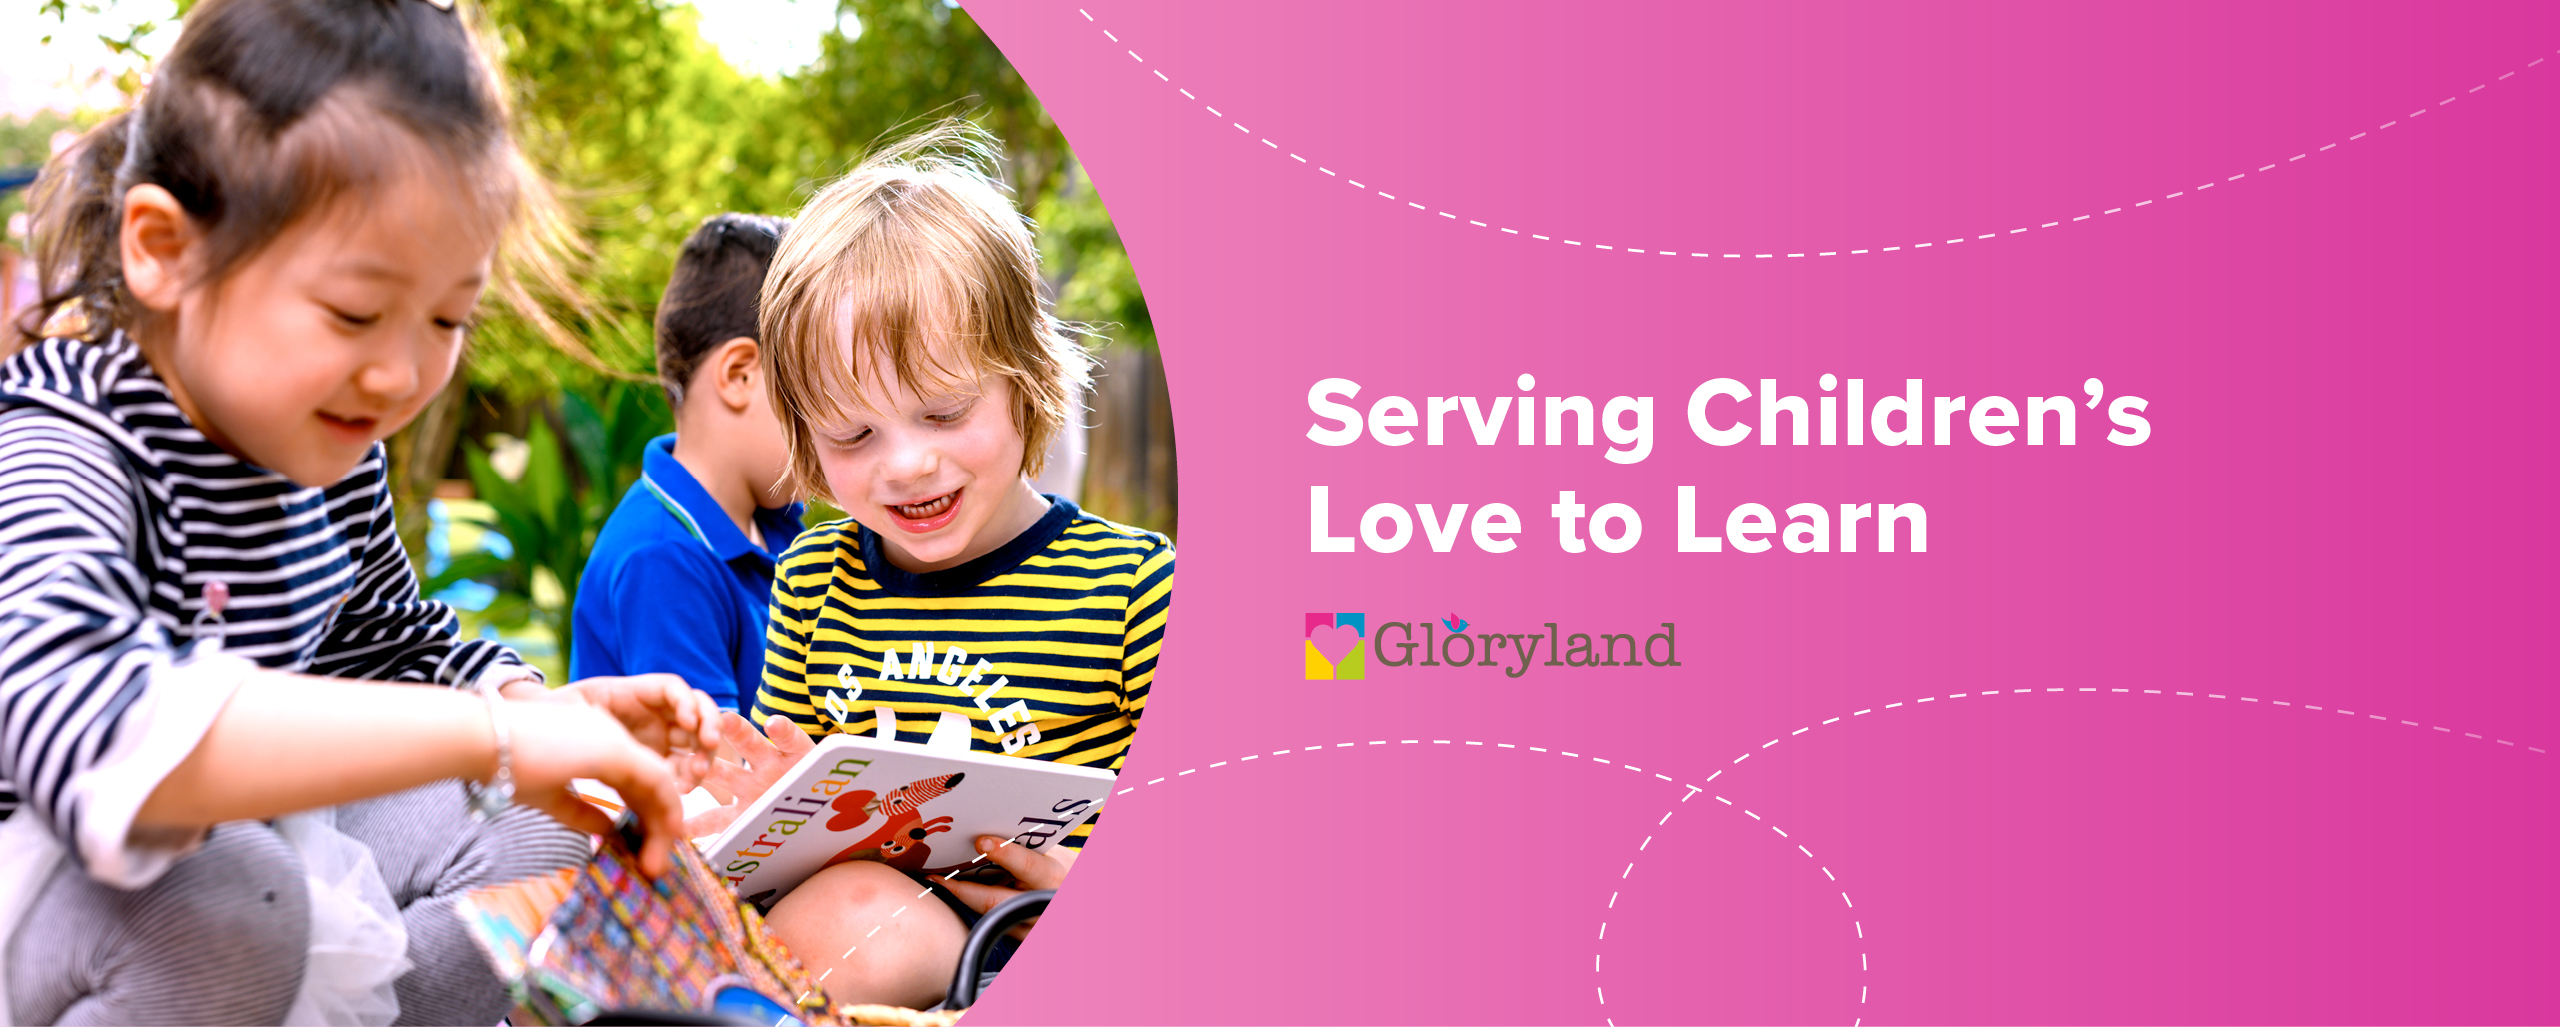 gloryland-banners-v2-4